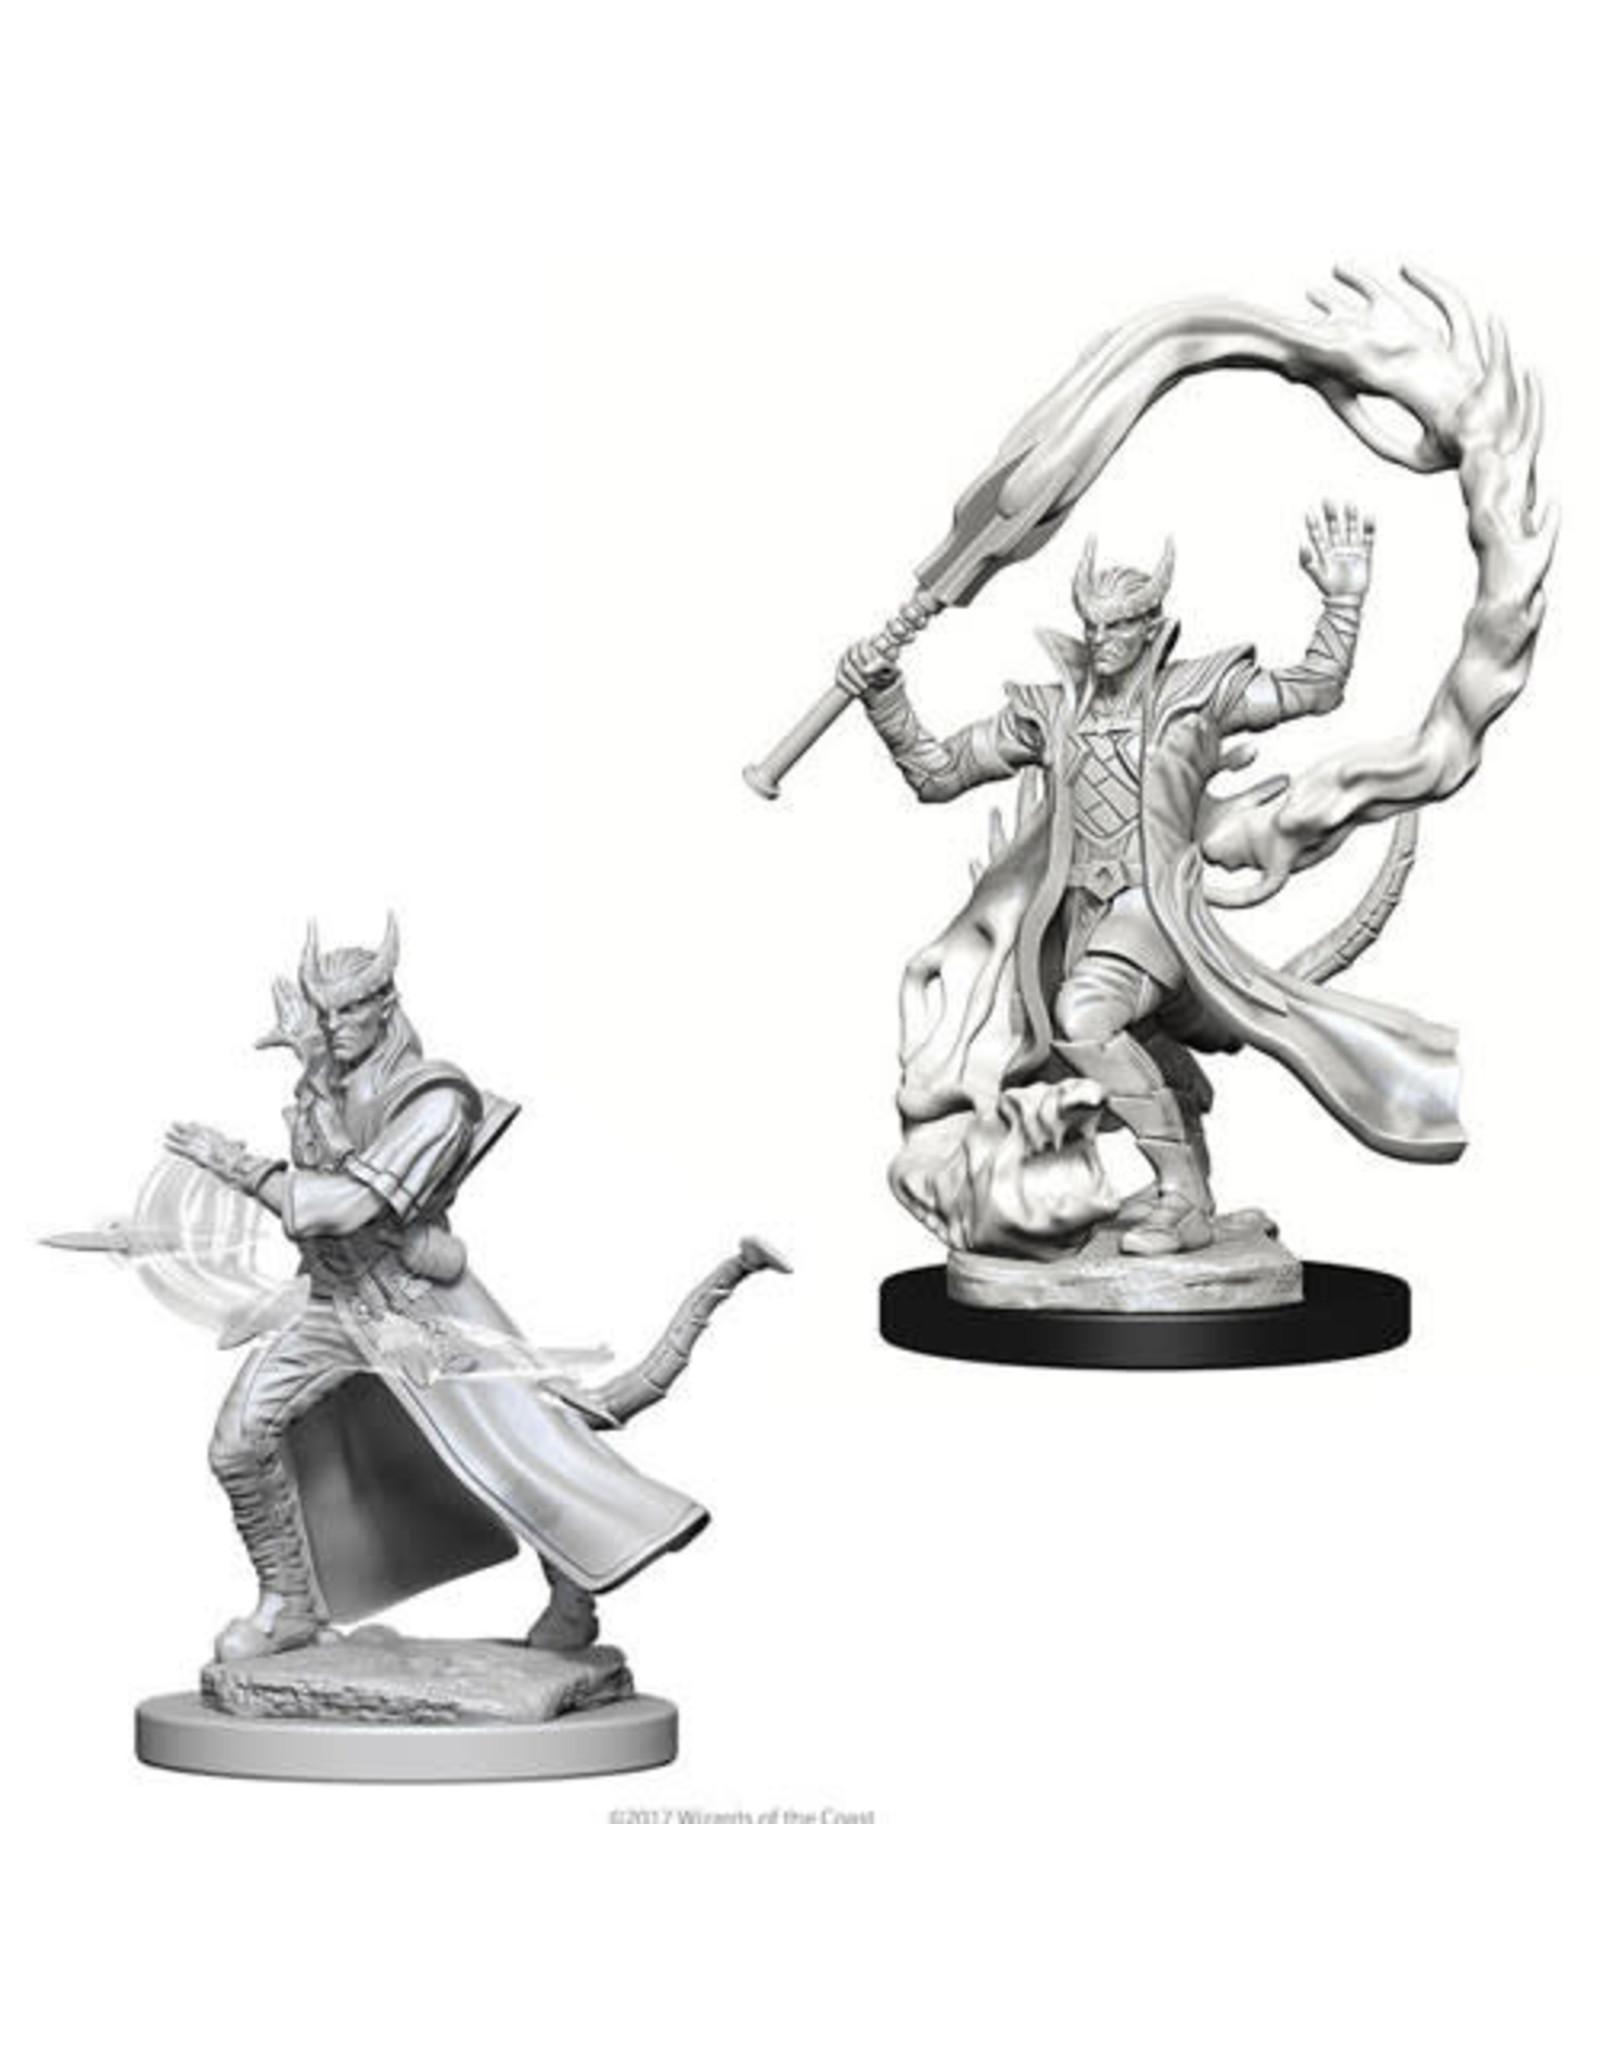 D&D Unpainted Minis: Tiefling Male Sorcerer